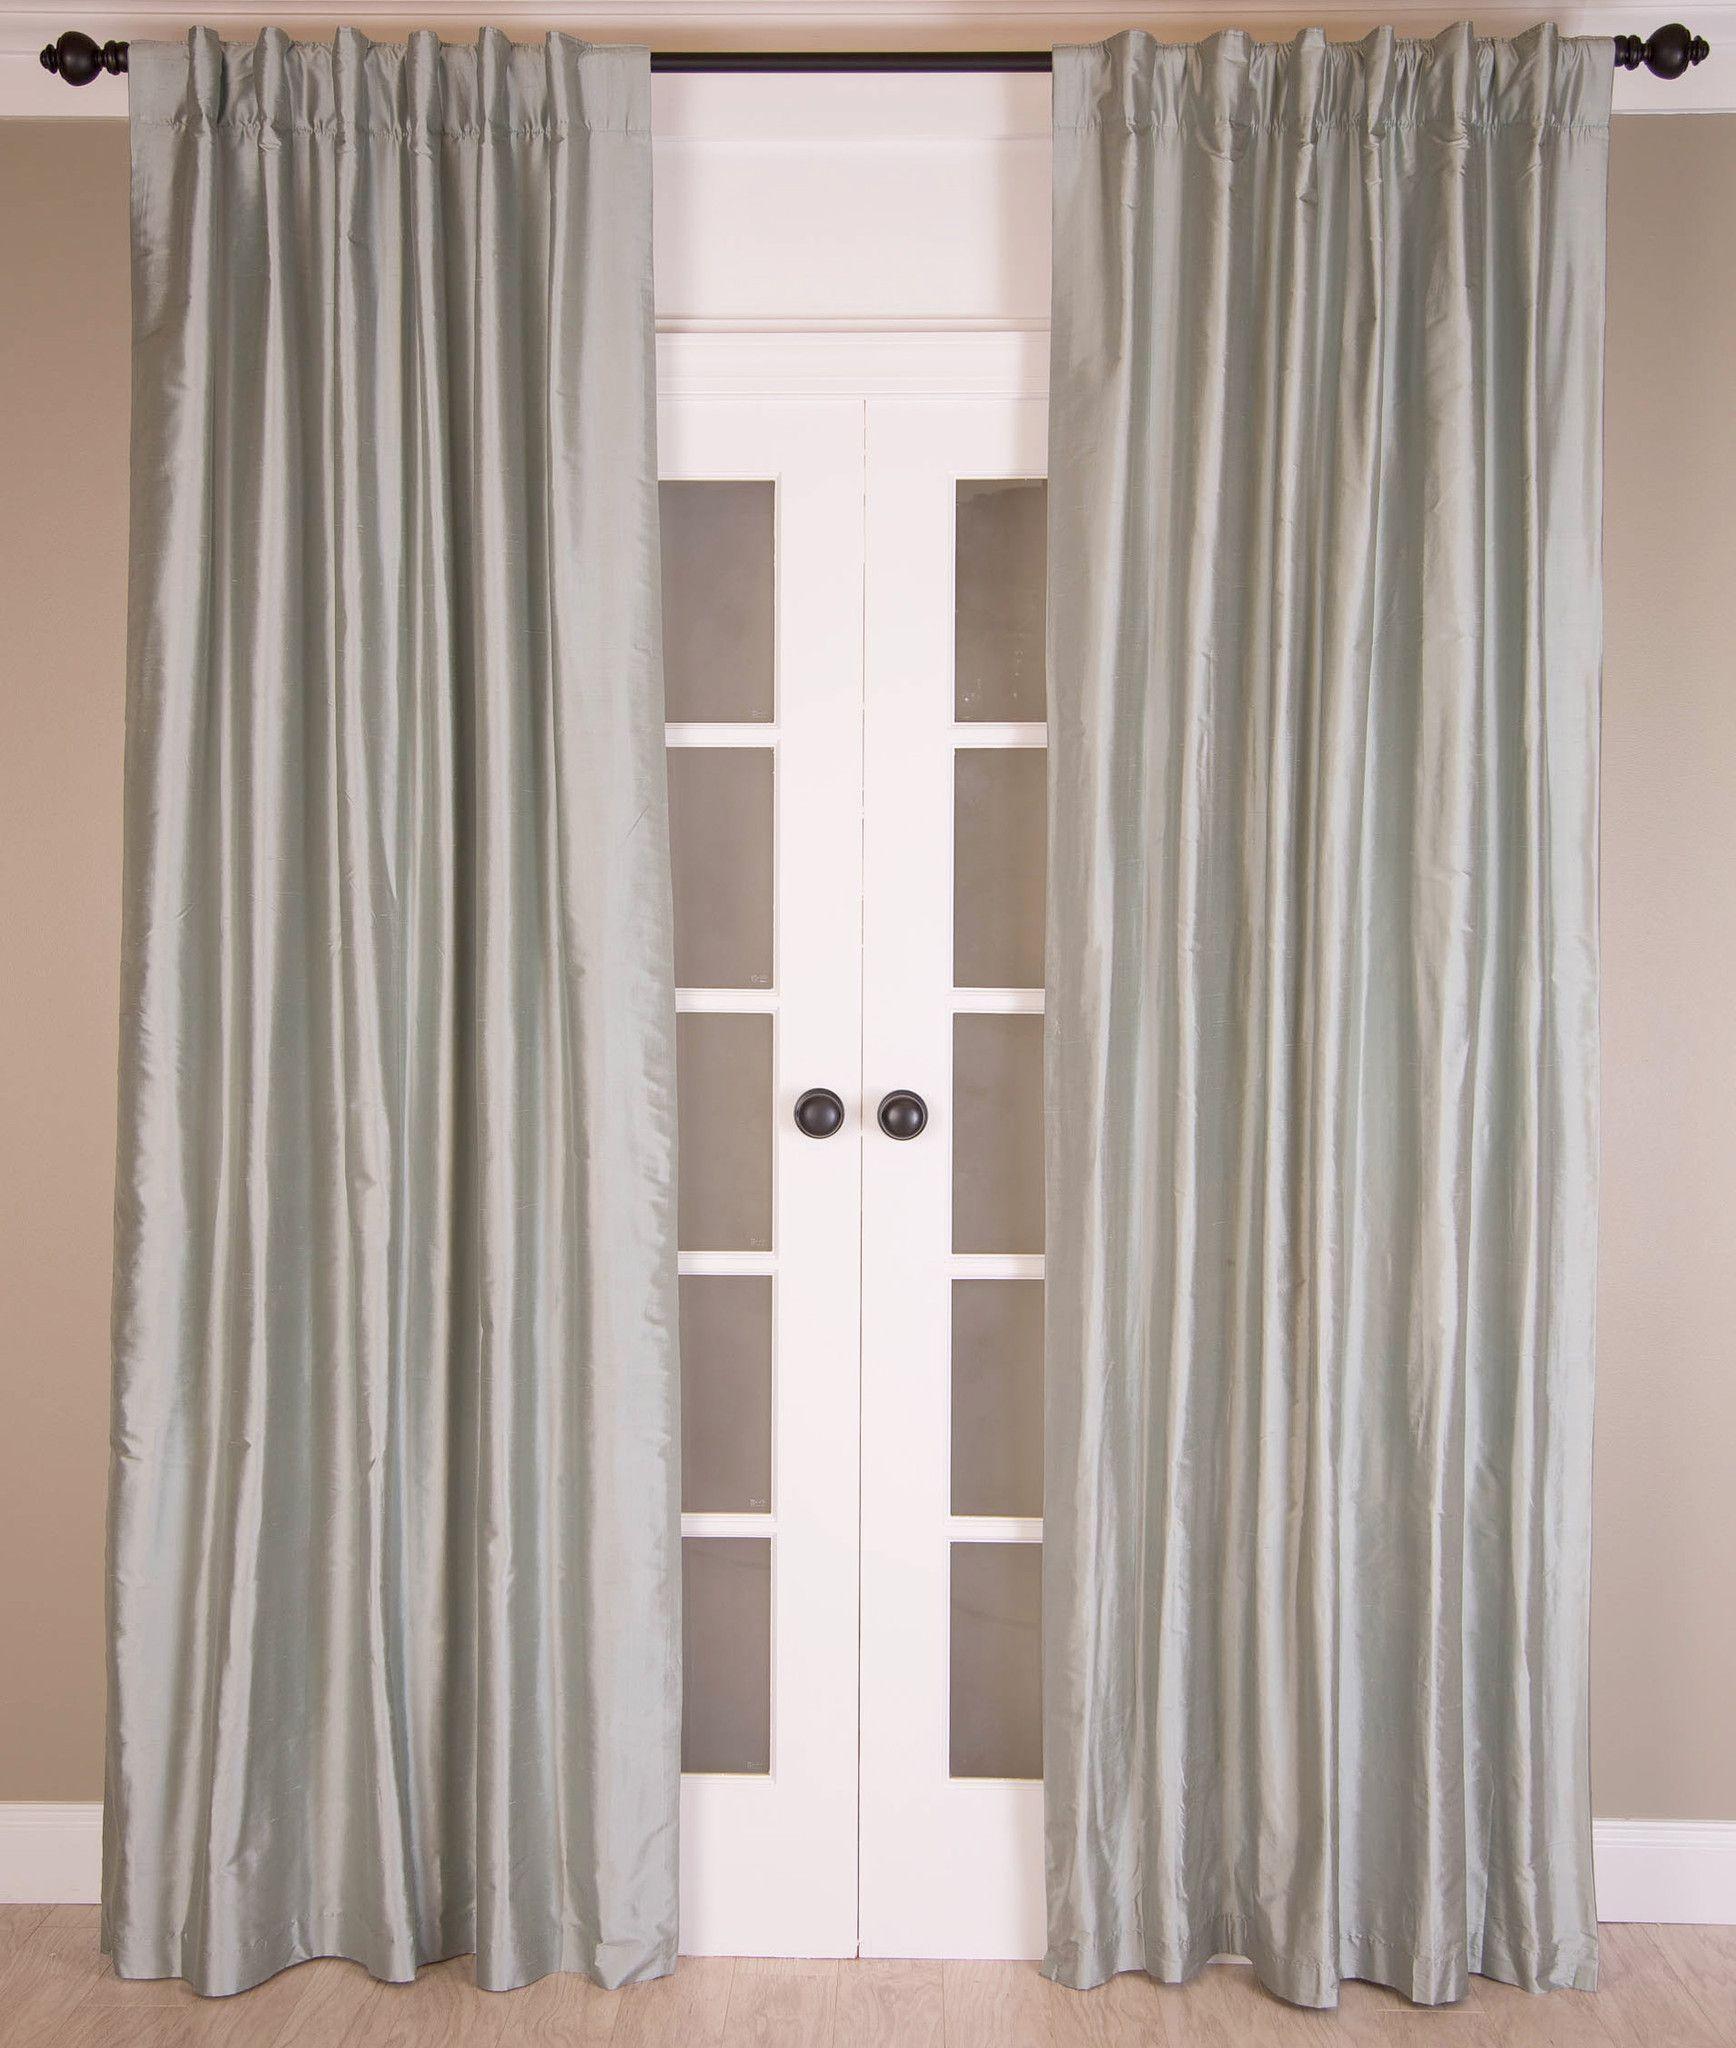 drapes amazon faux curtain curtains emerald green silk